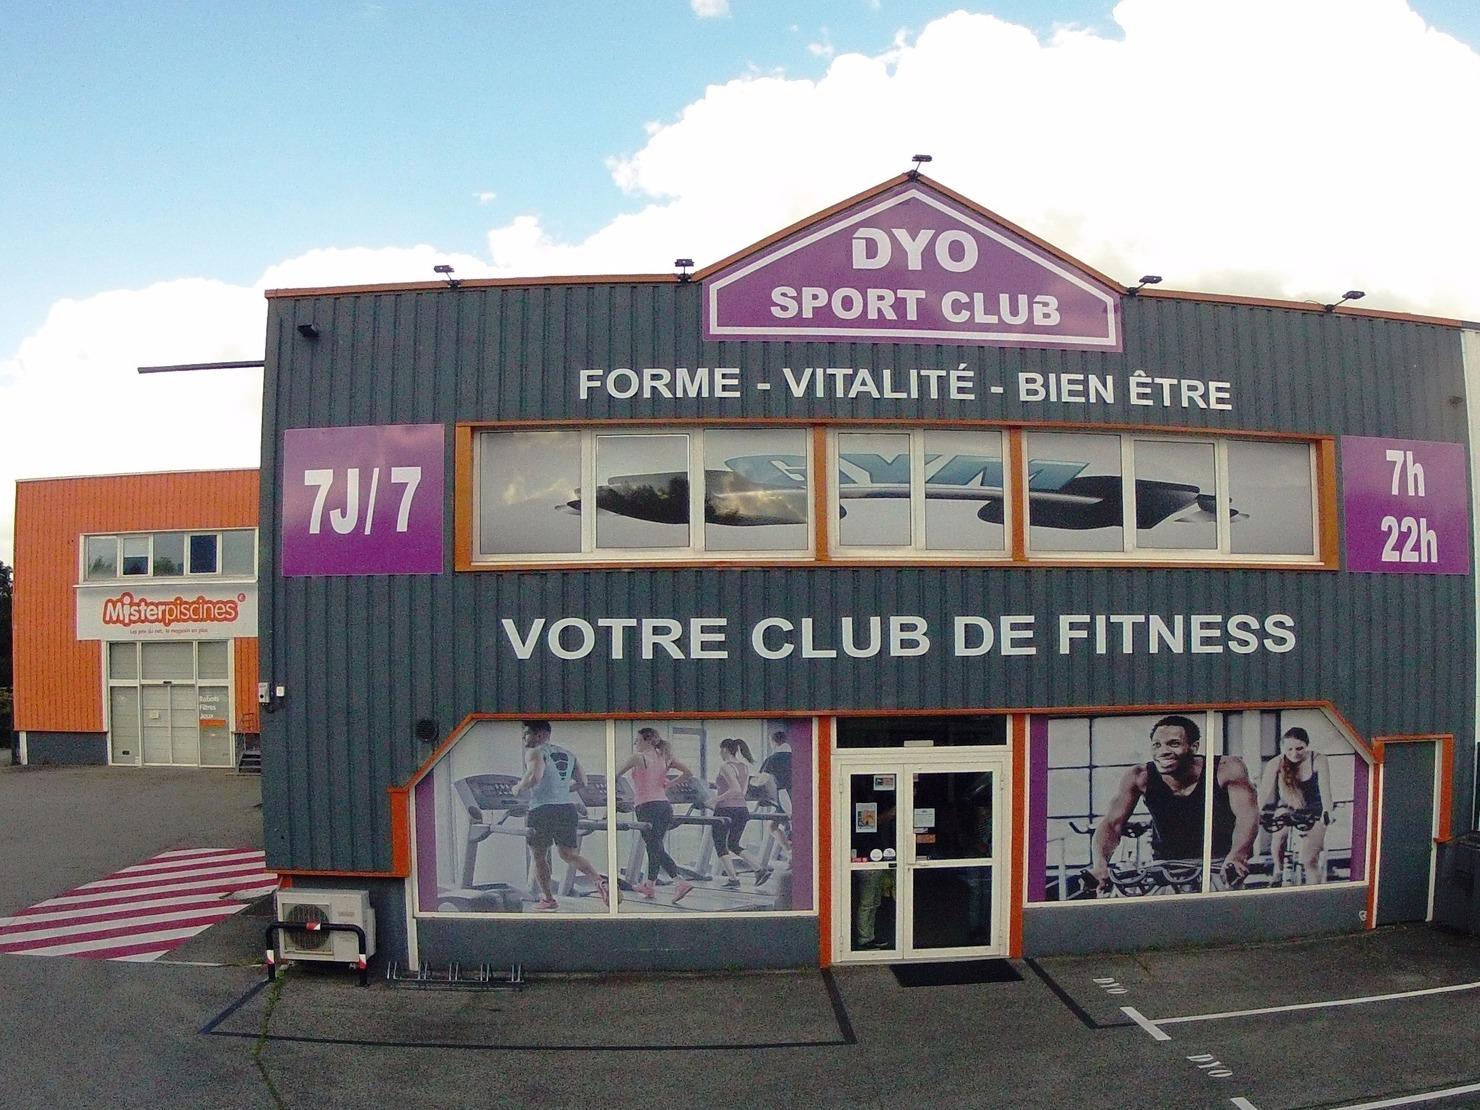 DYO SPORT CLUB à GIÈRES - SAINT MARTIN D'HÈRES | Tarifs